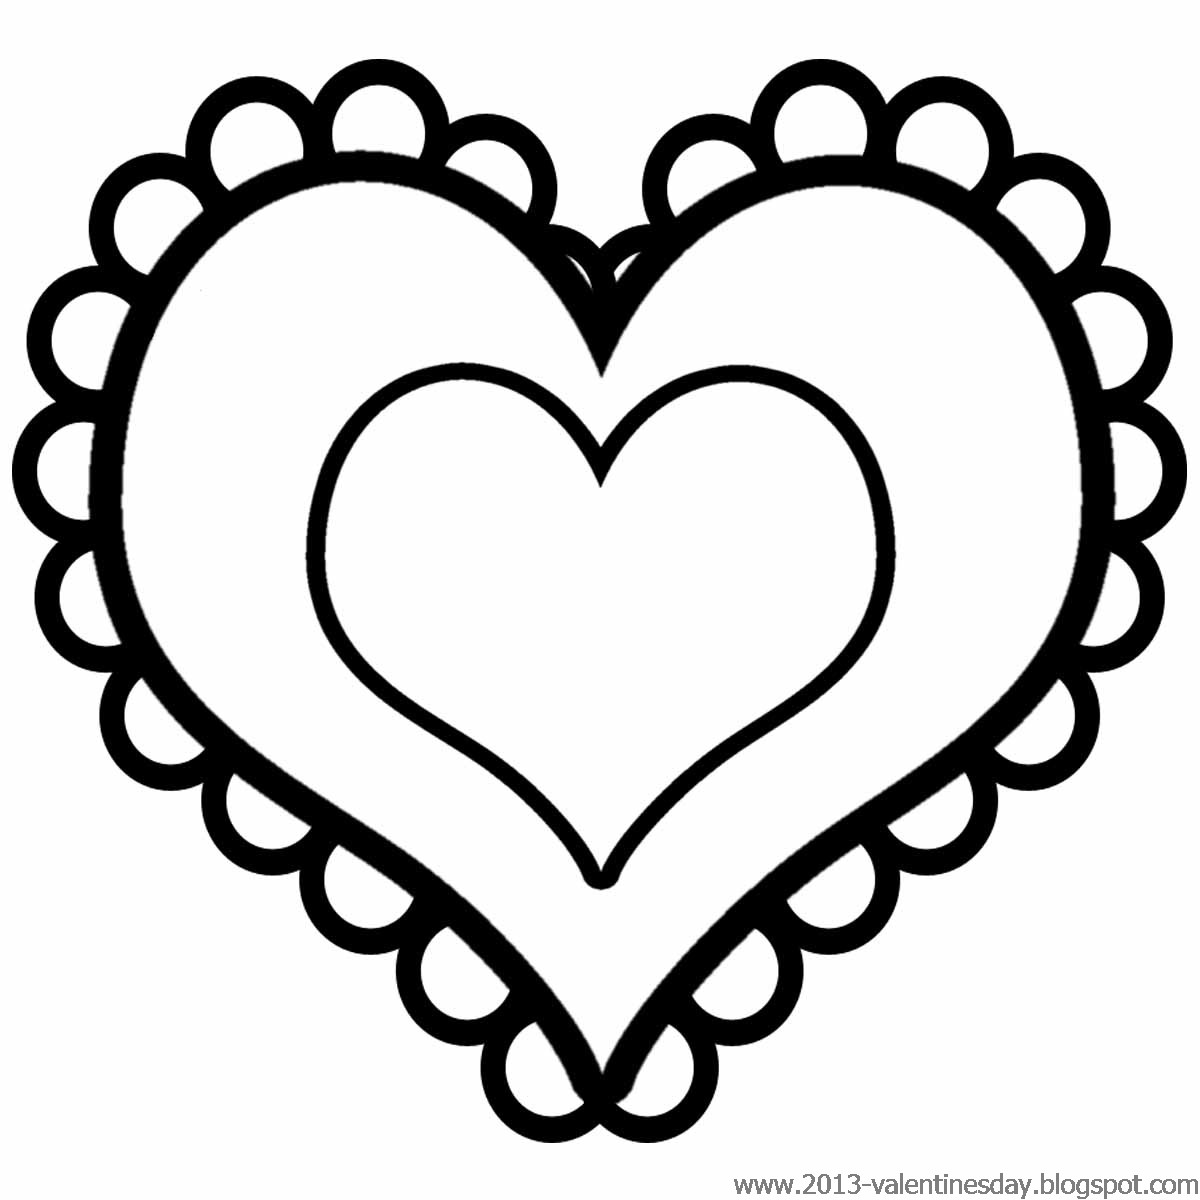 Heart black and white heart black and white clipart